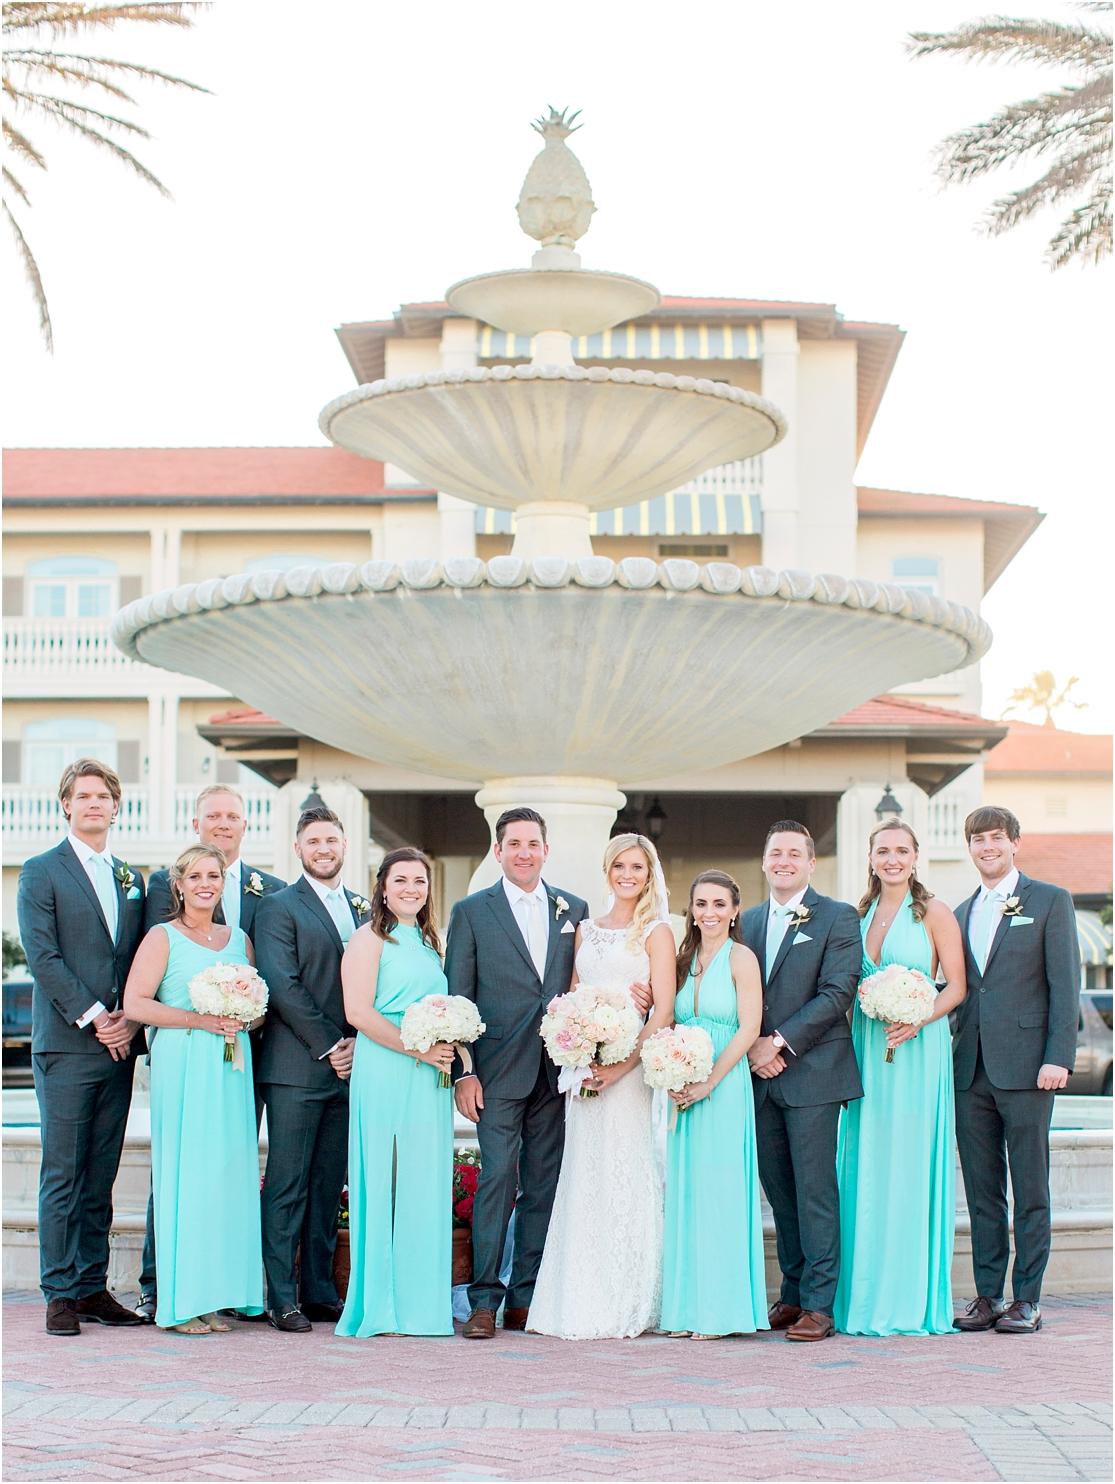 Lisa Silva Photography- Ponte Vedra Beach and Jacksonville, Florida Fine Art Film Wedding Photography- Wedding at the Ponte Vedra Inn and Club_0058.jpg